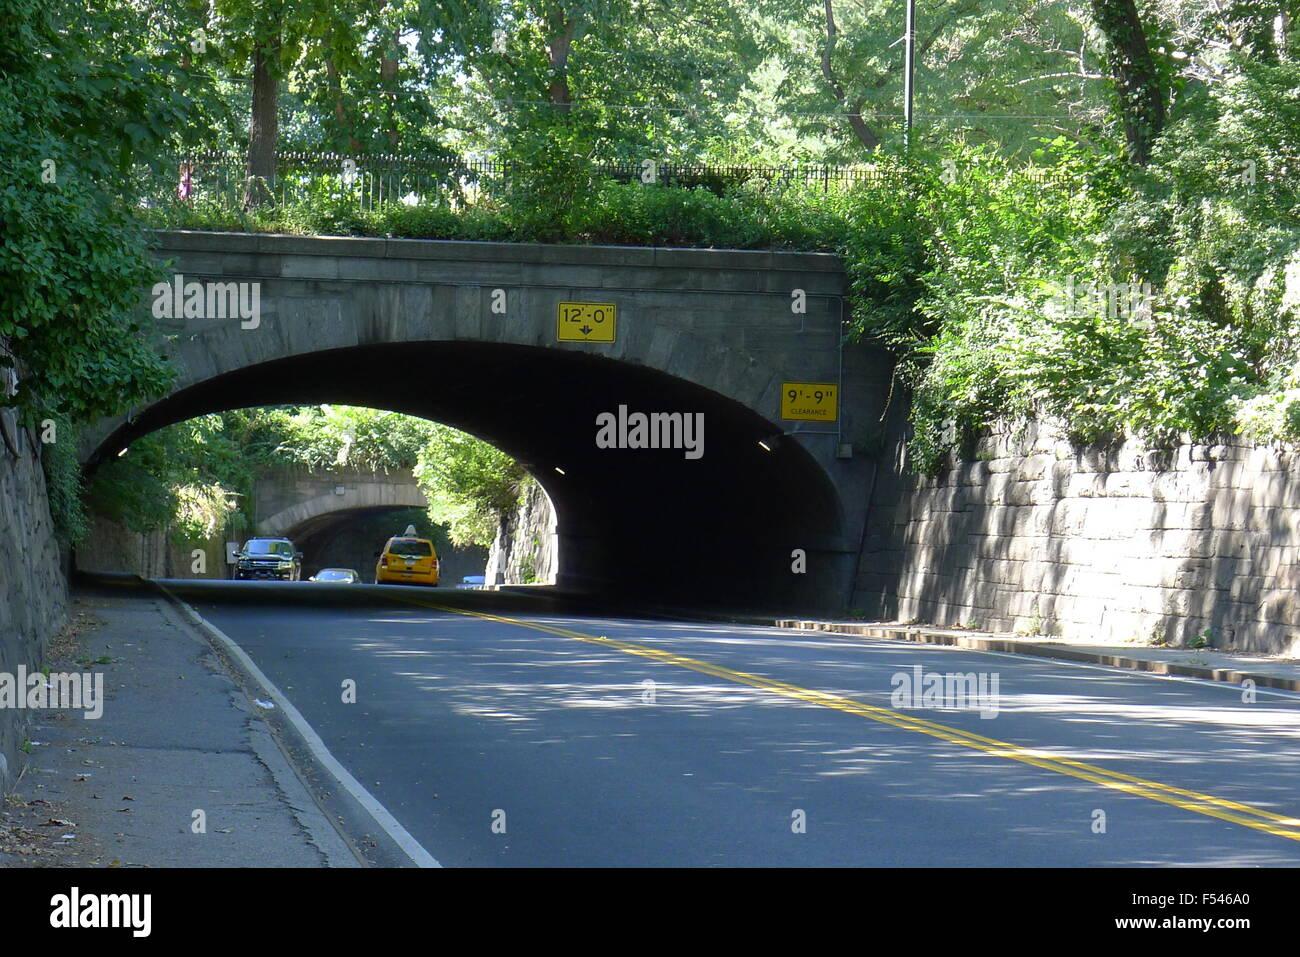 65th Street Transverse Through Central Park